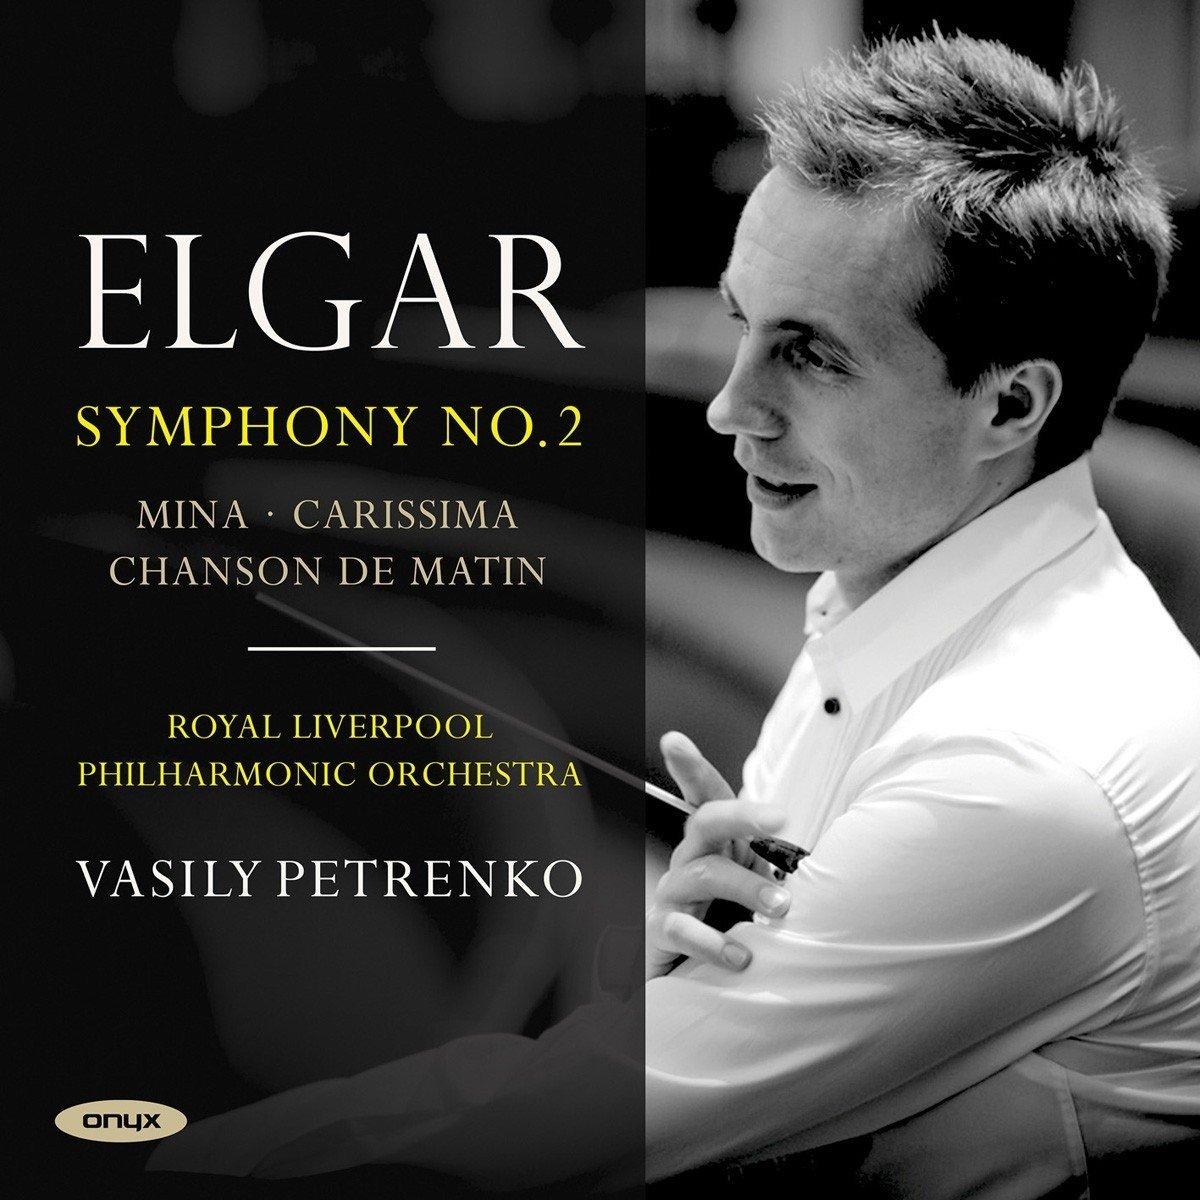 Elgar Symphony No 2 RLPO/Petrenko